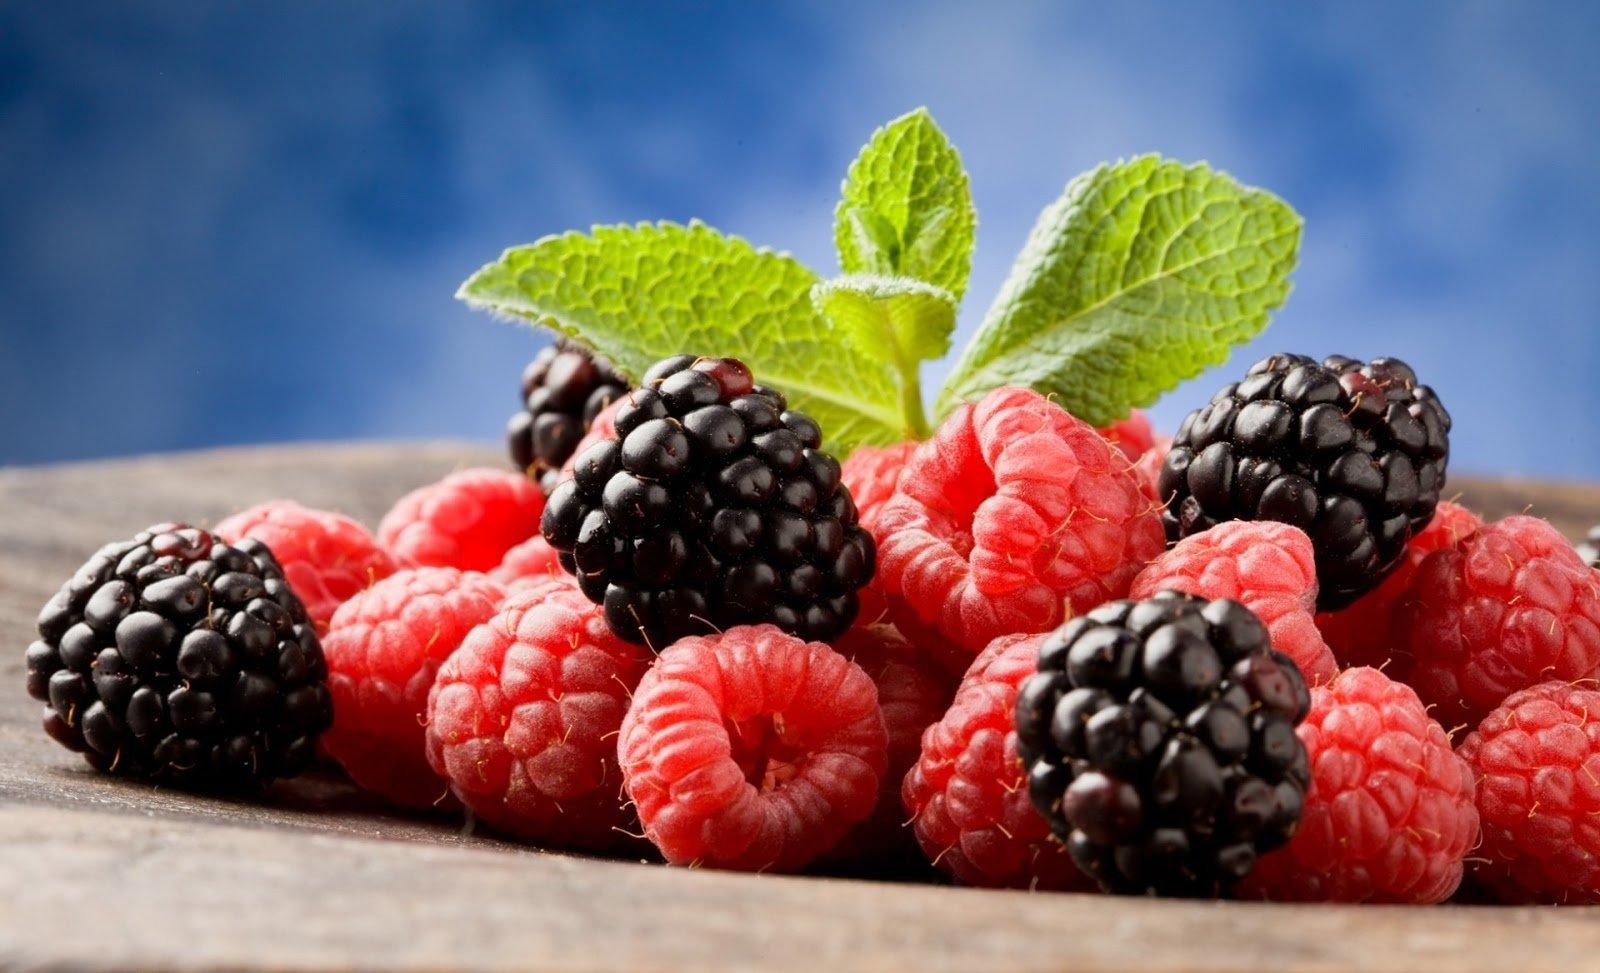 Blackberry fruit wallpaper - Fruits Blackberry Fruit Delicious Beauty Wallpaper 1600x973 683532 Wallpaperup